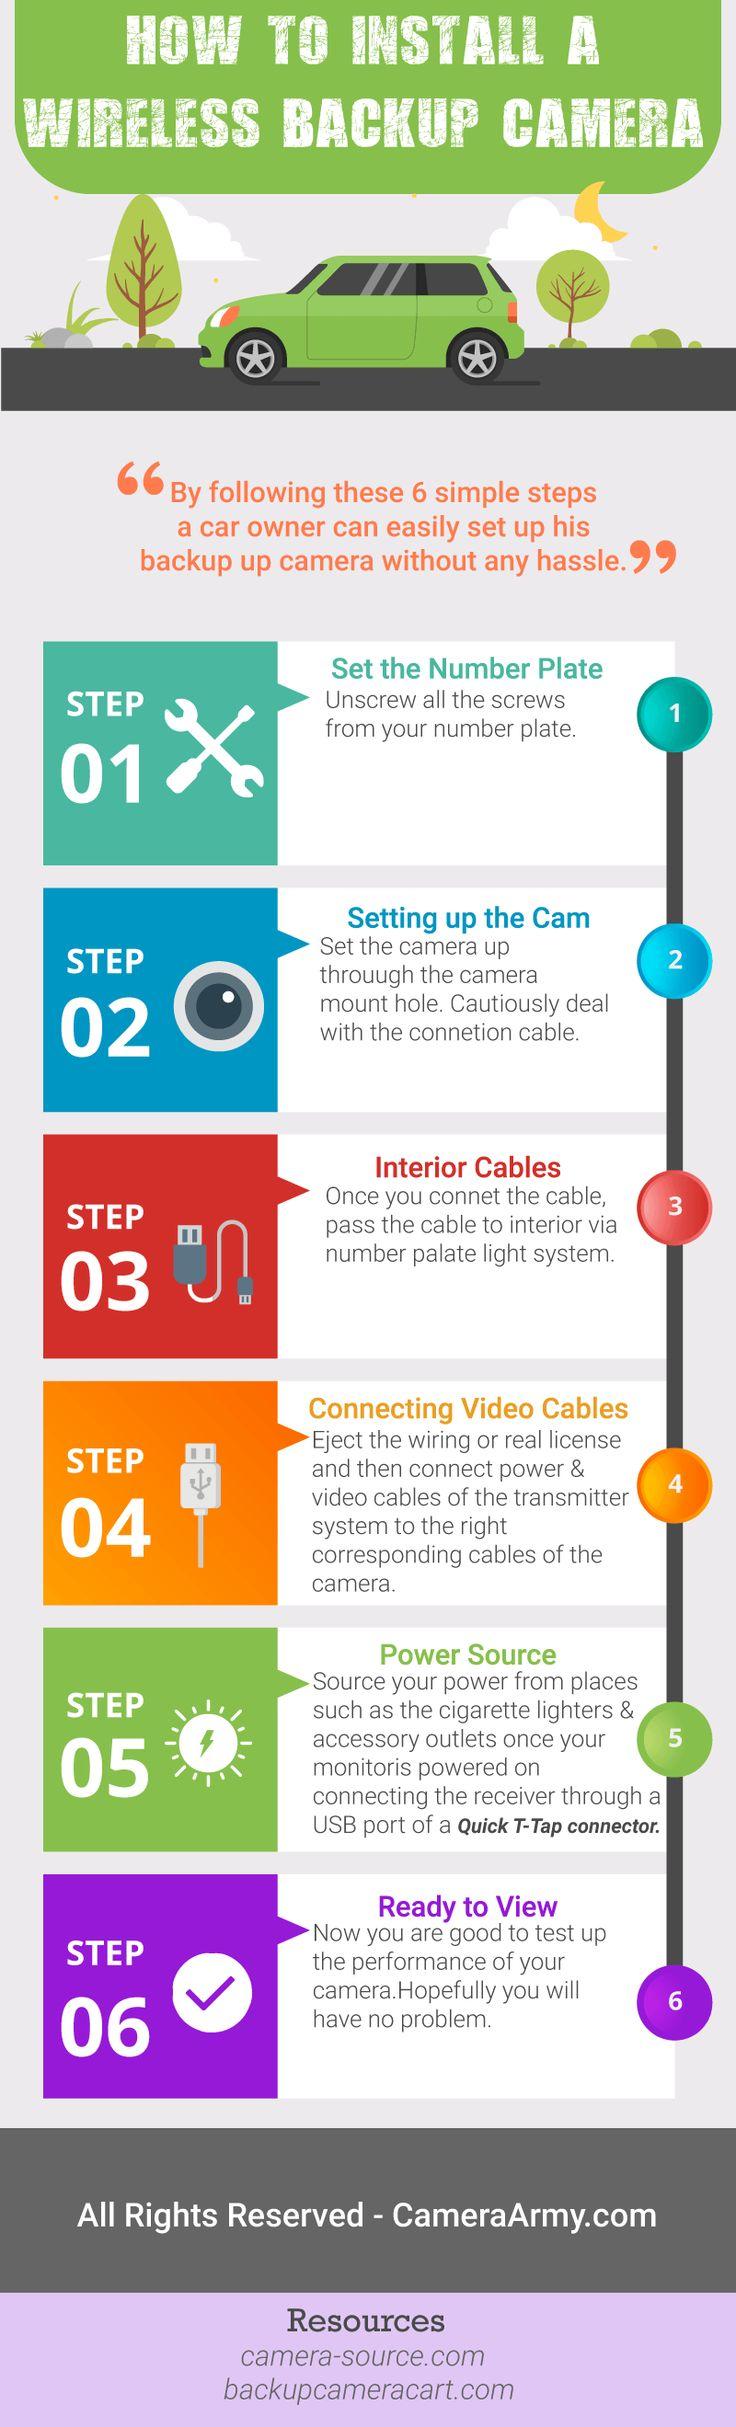 Backup Camera Installation Instructions Camera army